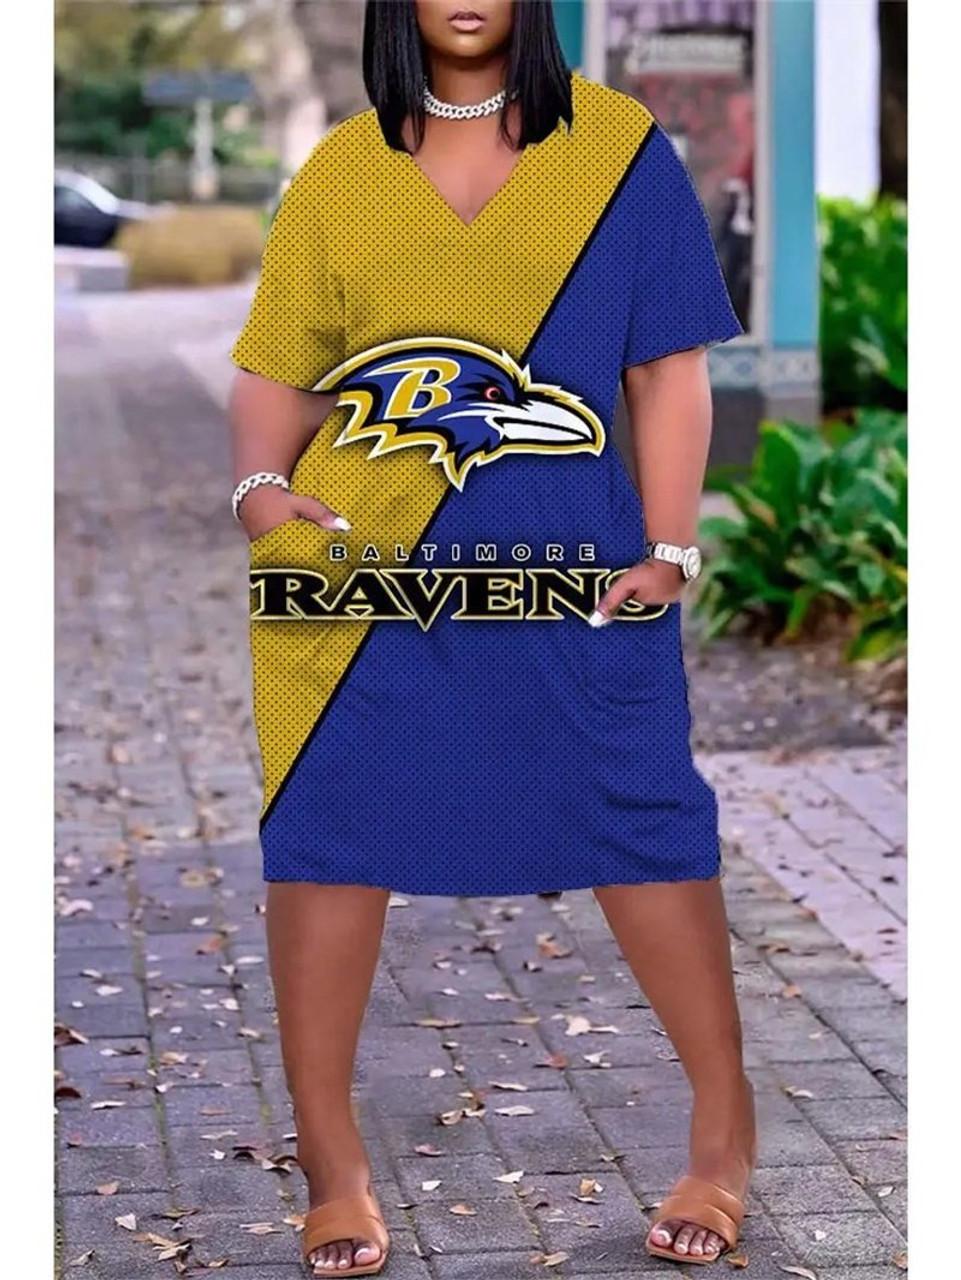 **(Official NFL.Baltimore-Ravens-Team Limited Edition Trendy V-Neck Casual Womens Knee Length Ravens Team Game/Day Sport Pocket Dress)**